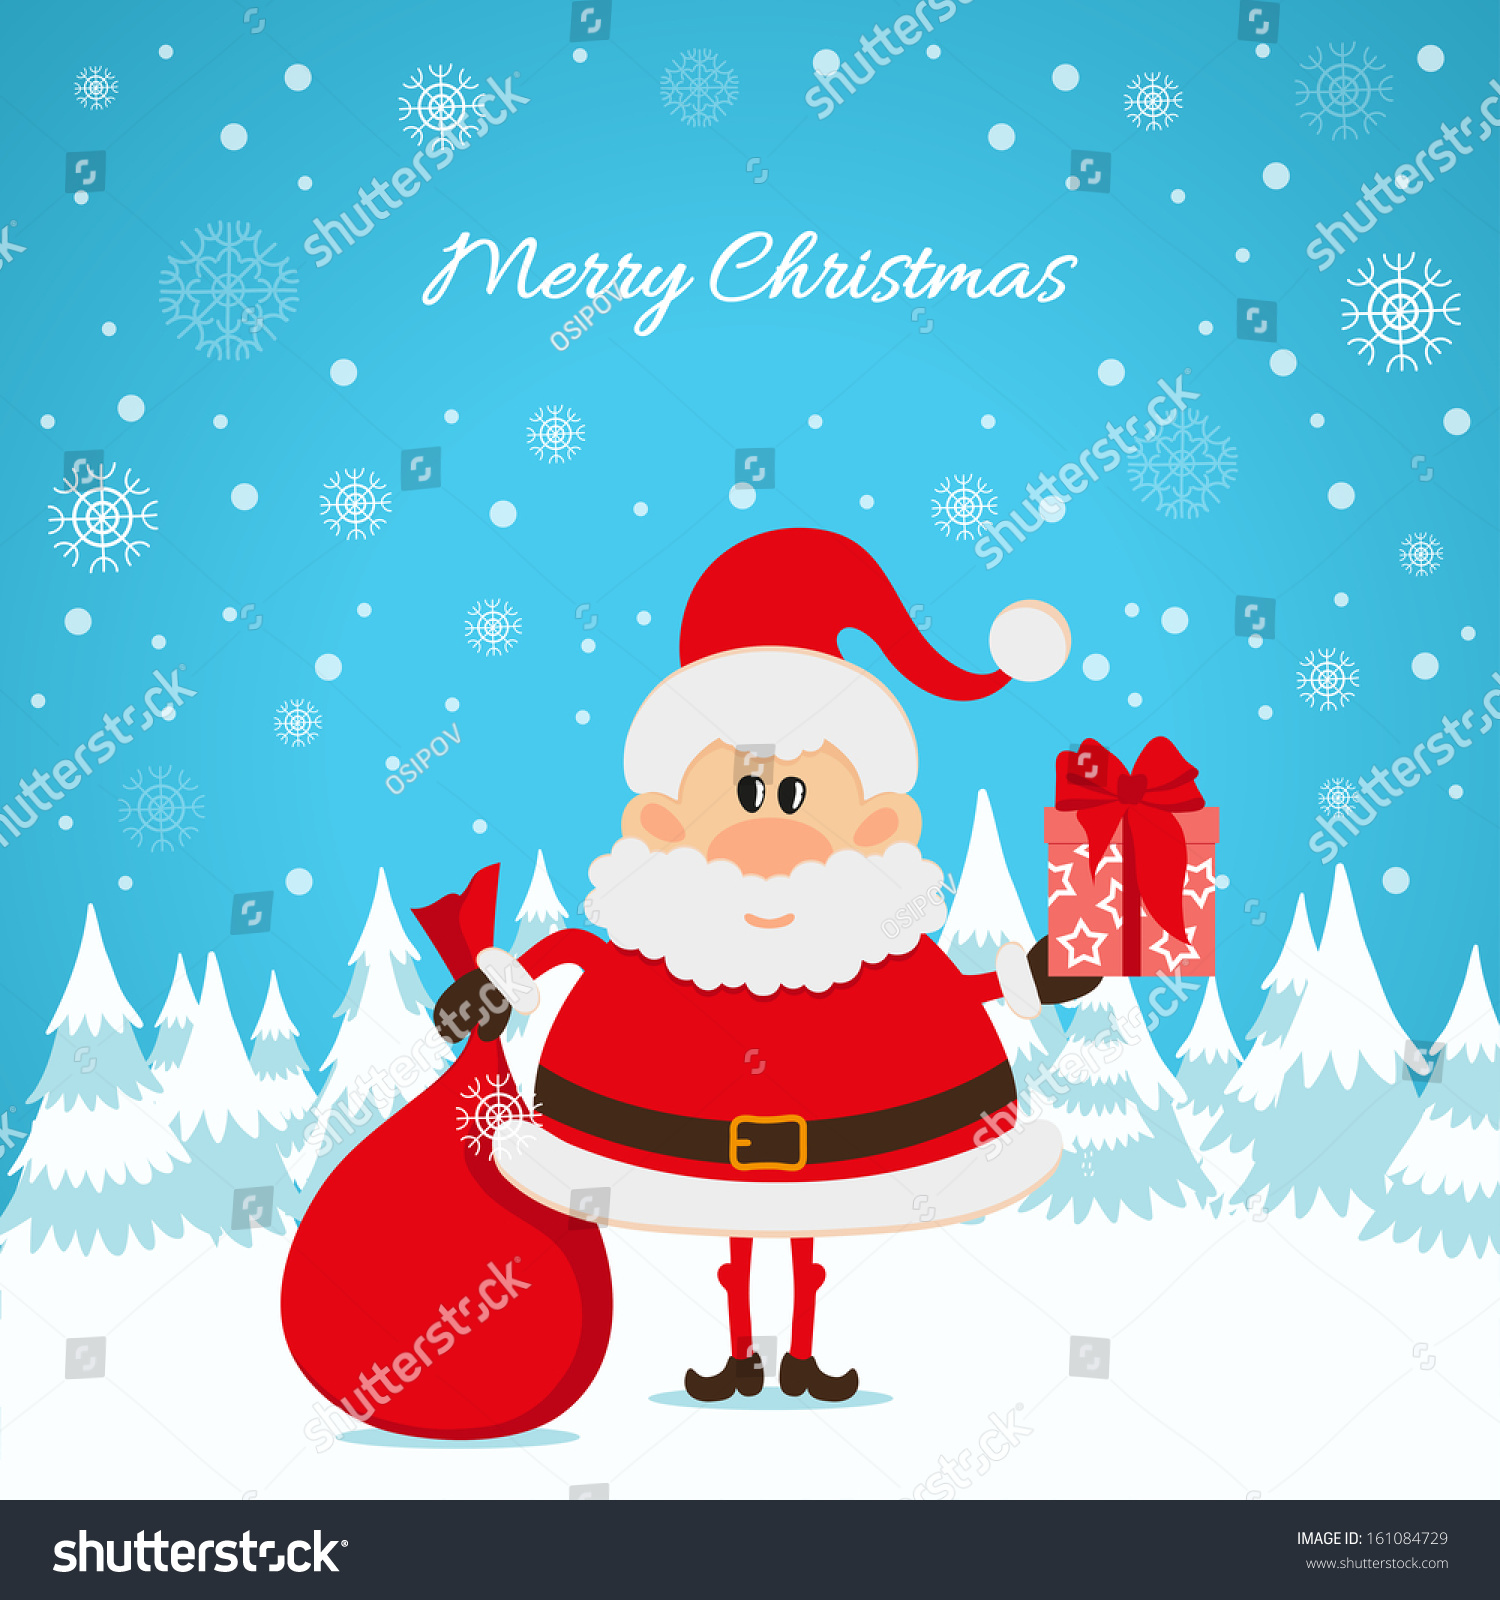 Santa Claus Red Bag Gifts Christmas Stock Illustration